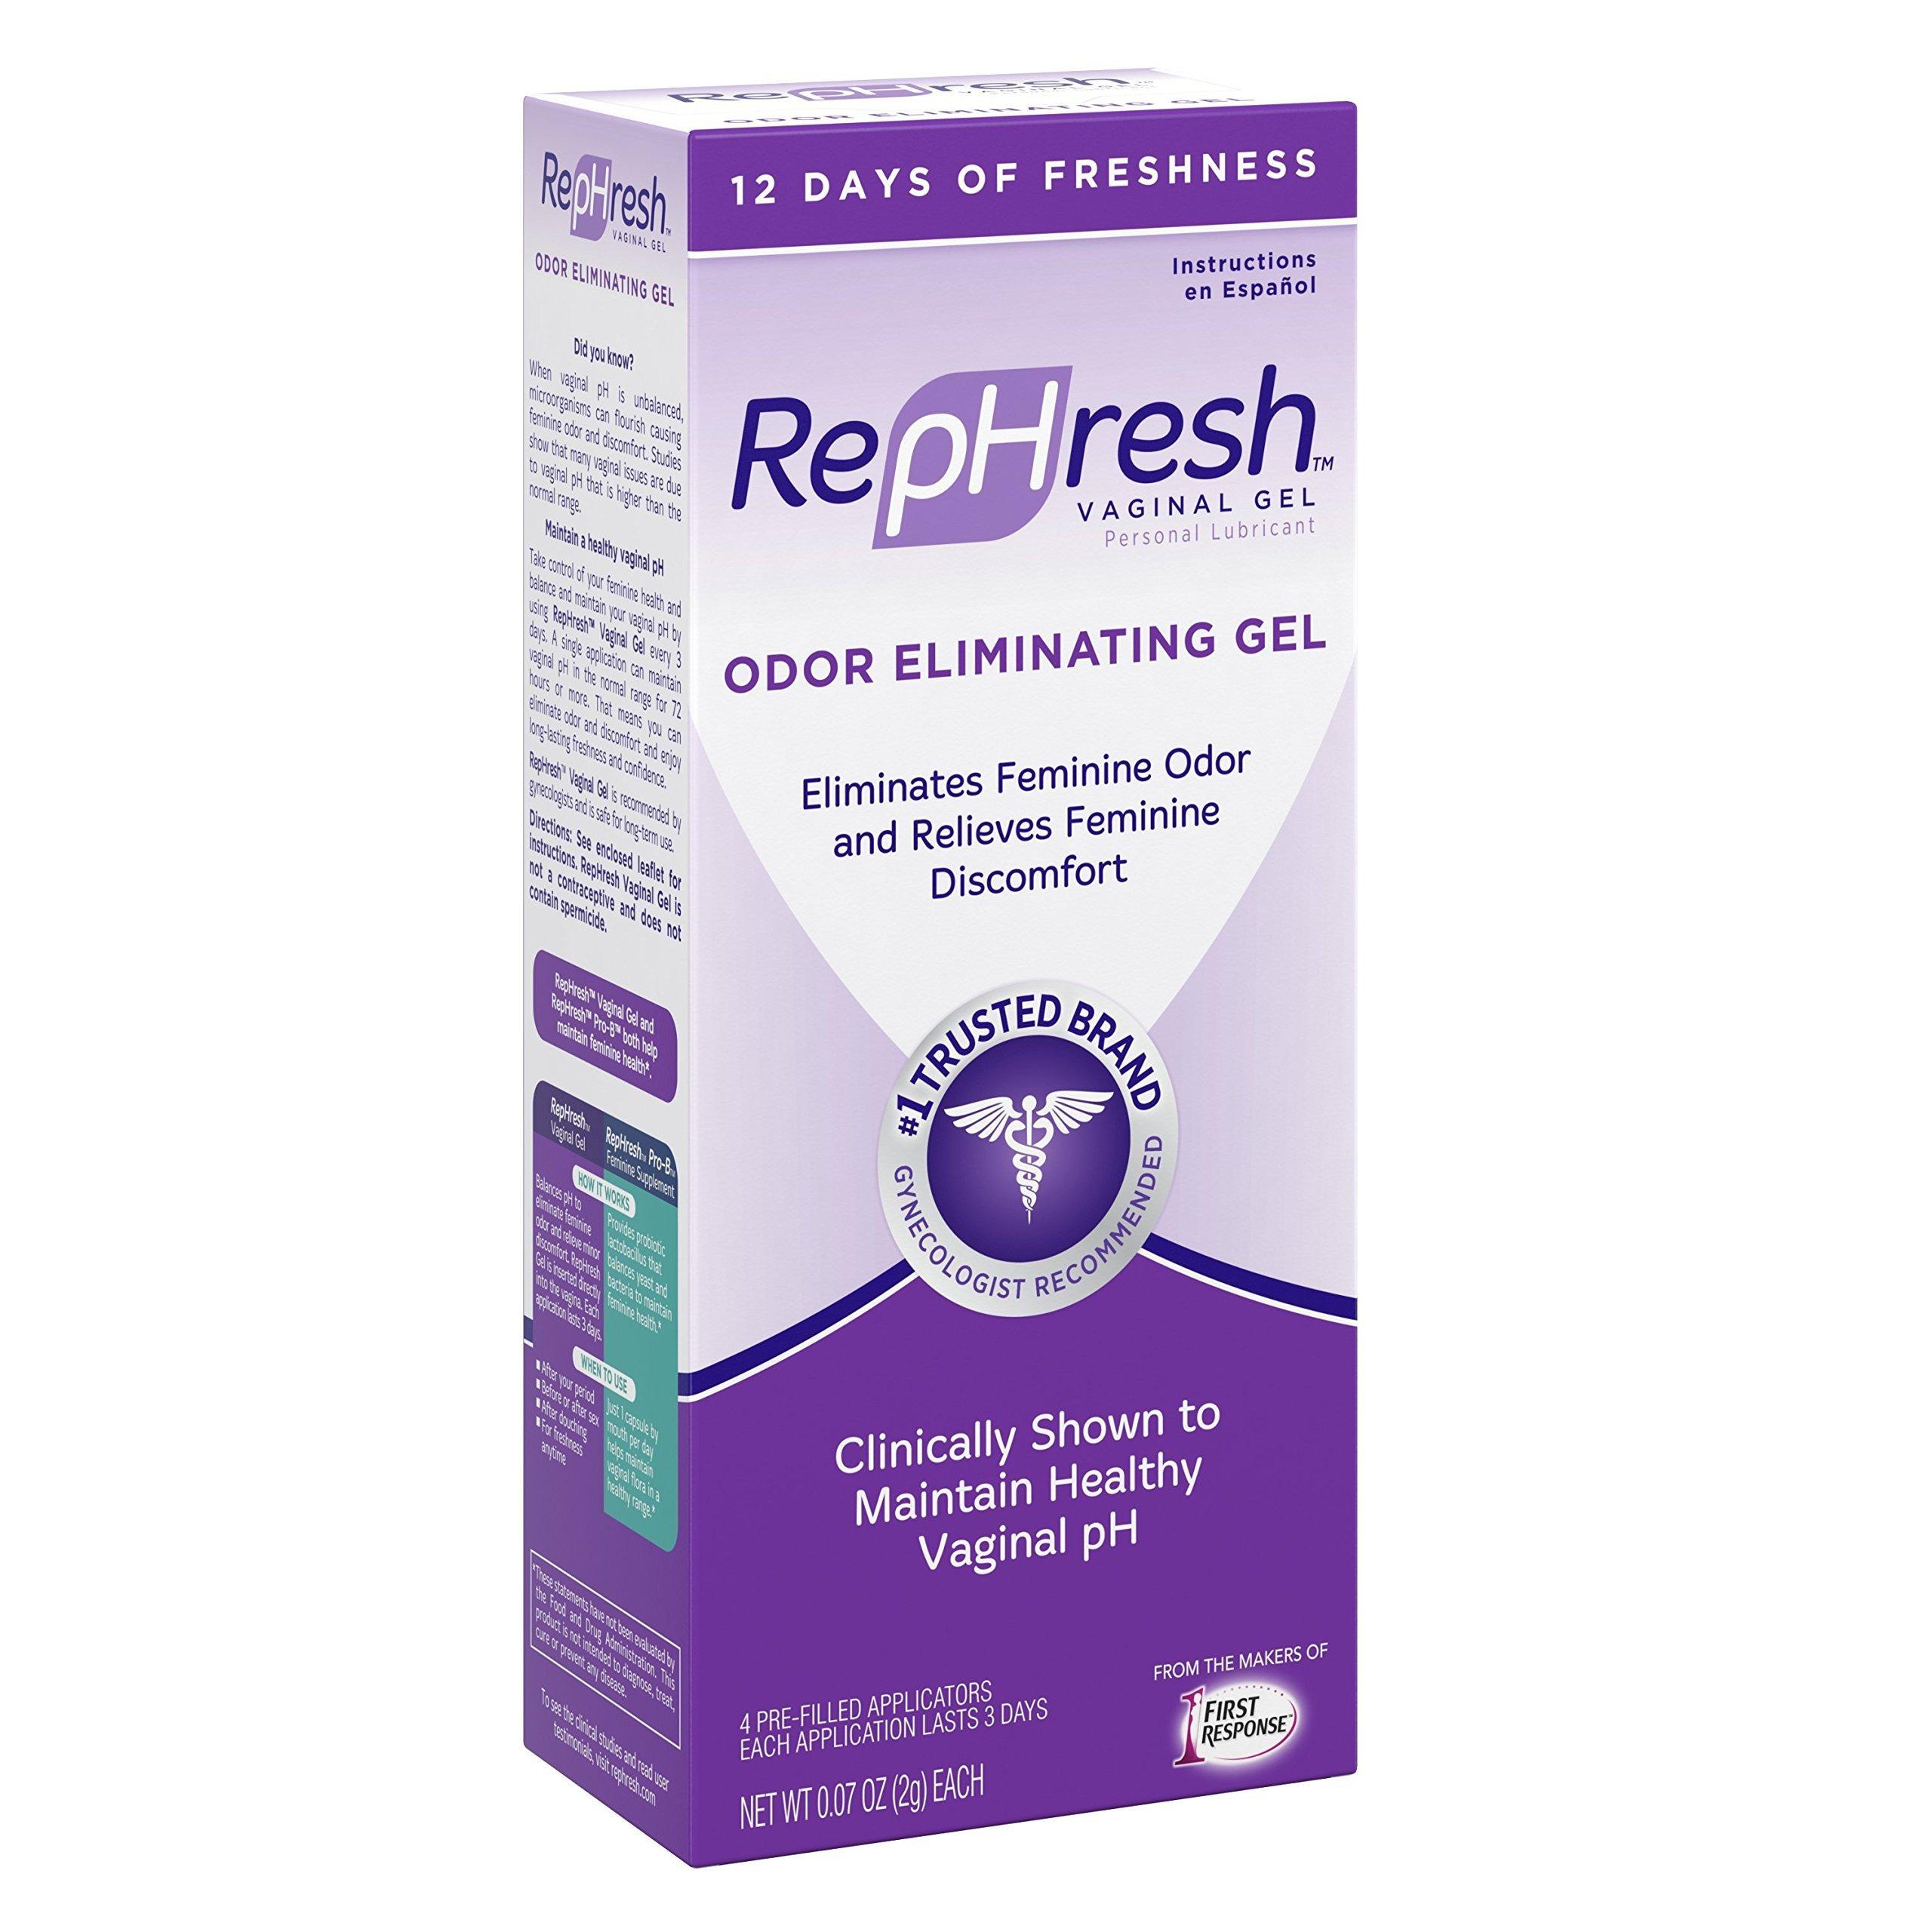 RepHresh Vaginal Gel, 0.07 Oz, 4 Count